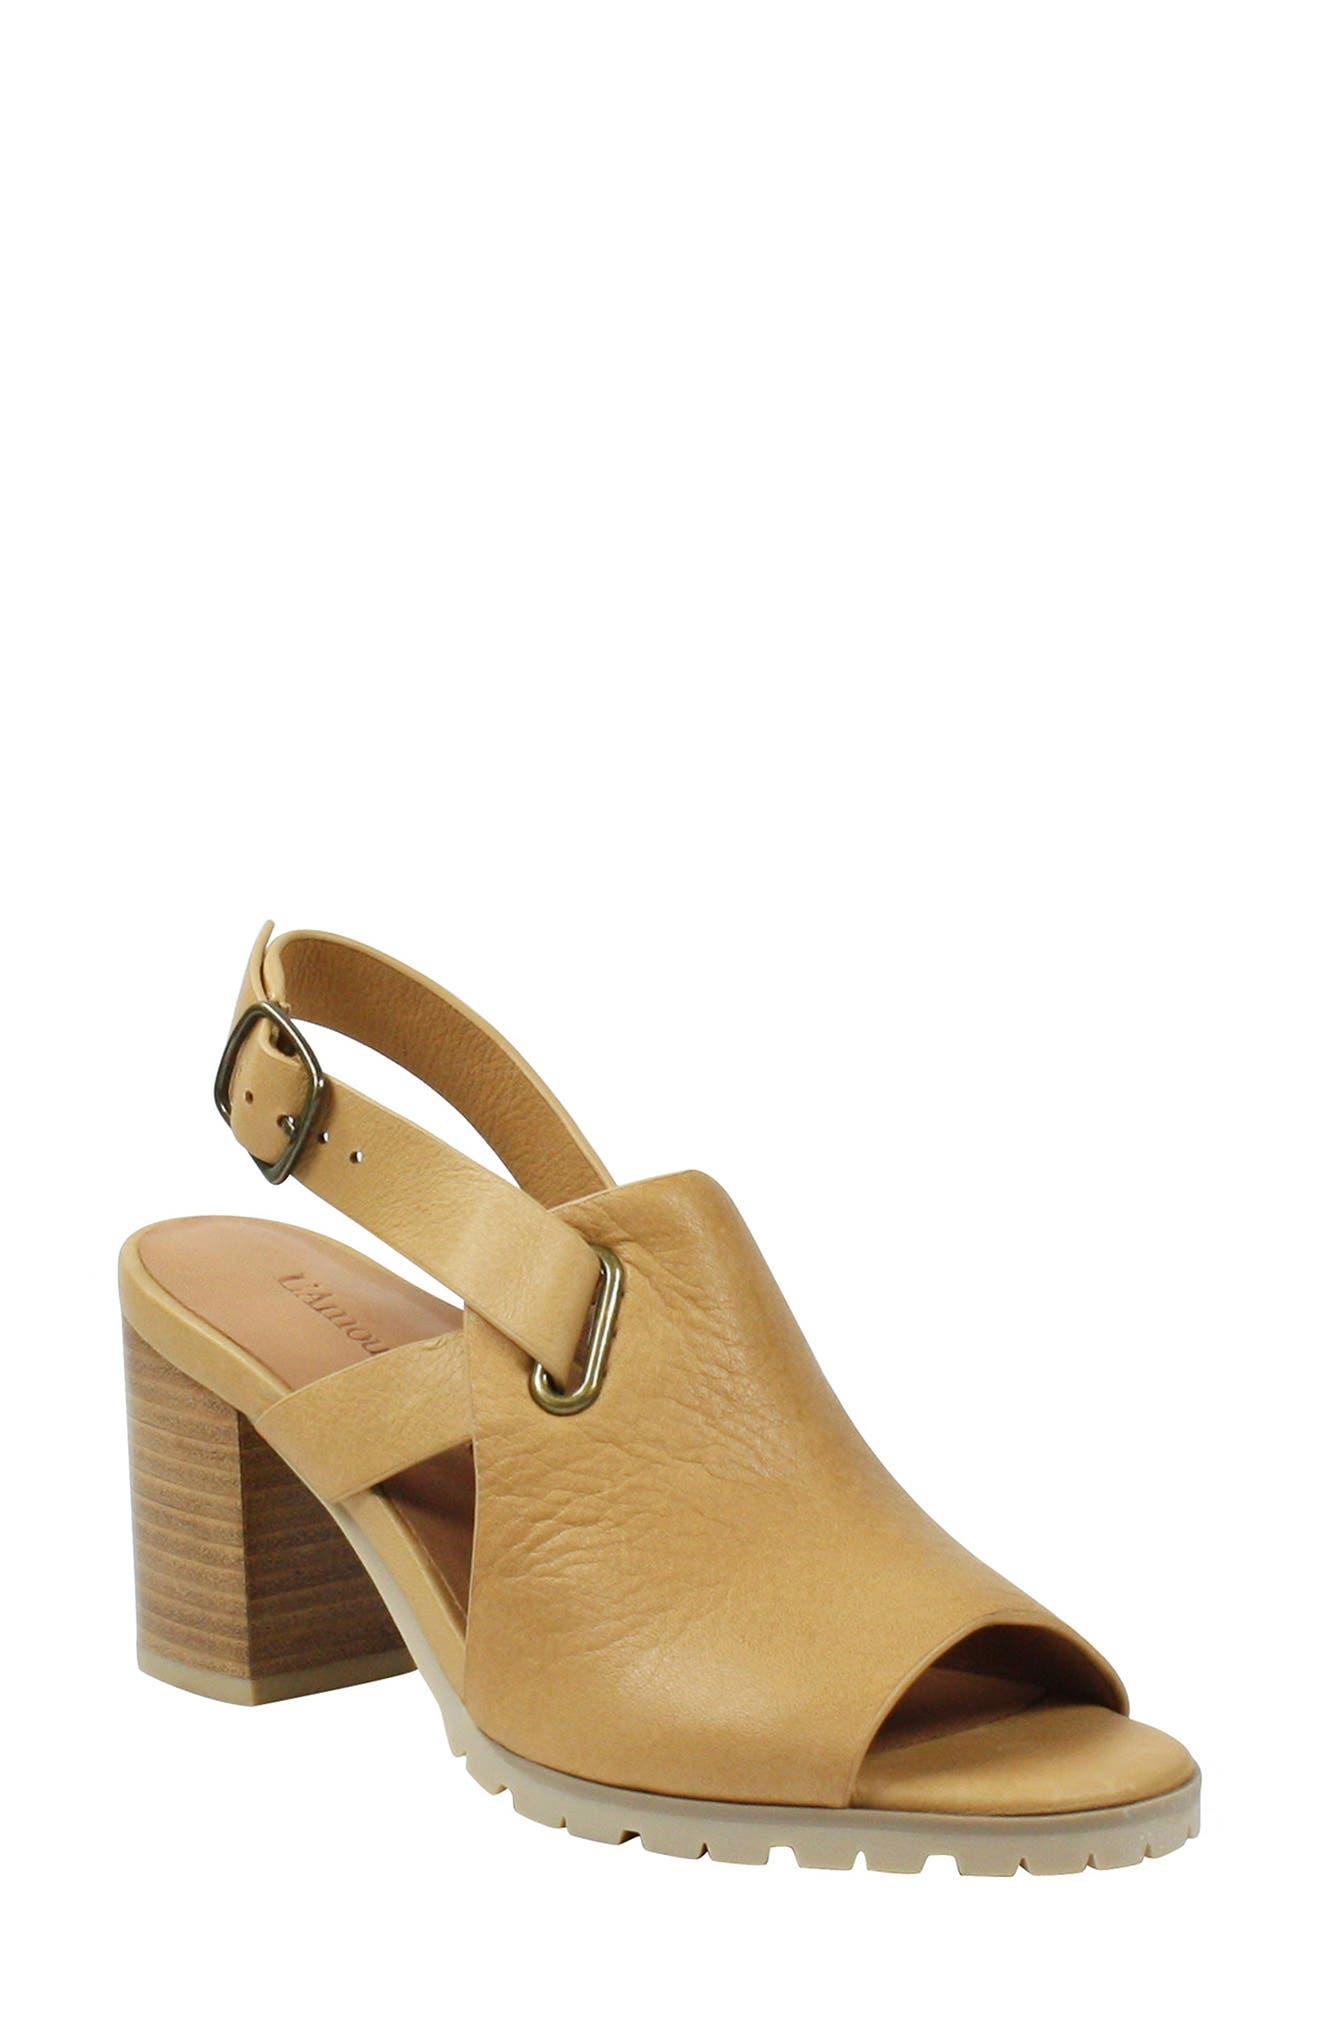 Quenton Slingback Sandal